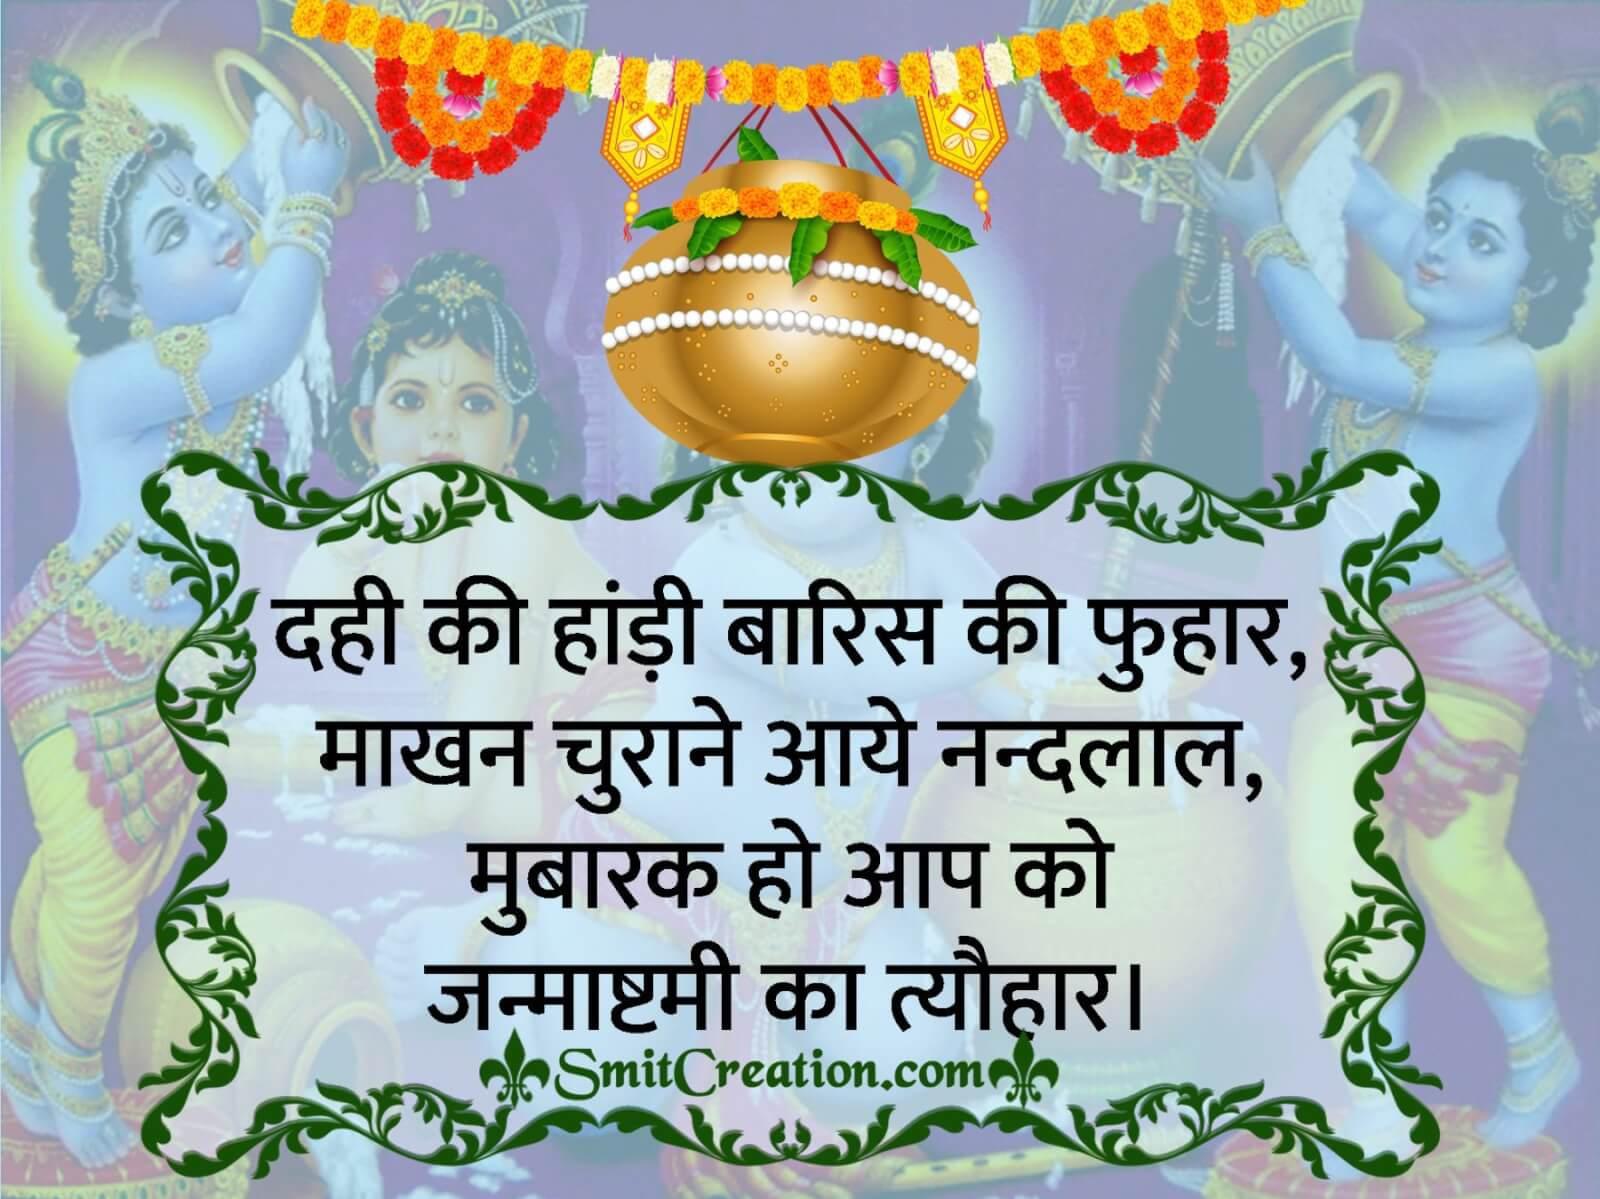 Happy Dahi Handi : Best Govinda Messages, WhatsApp And Facebook Status, Quotes, Wishes, Share on This Janmashtami